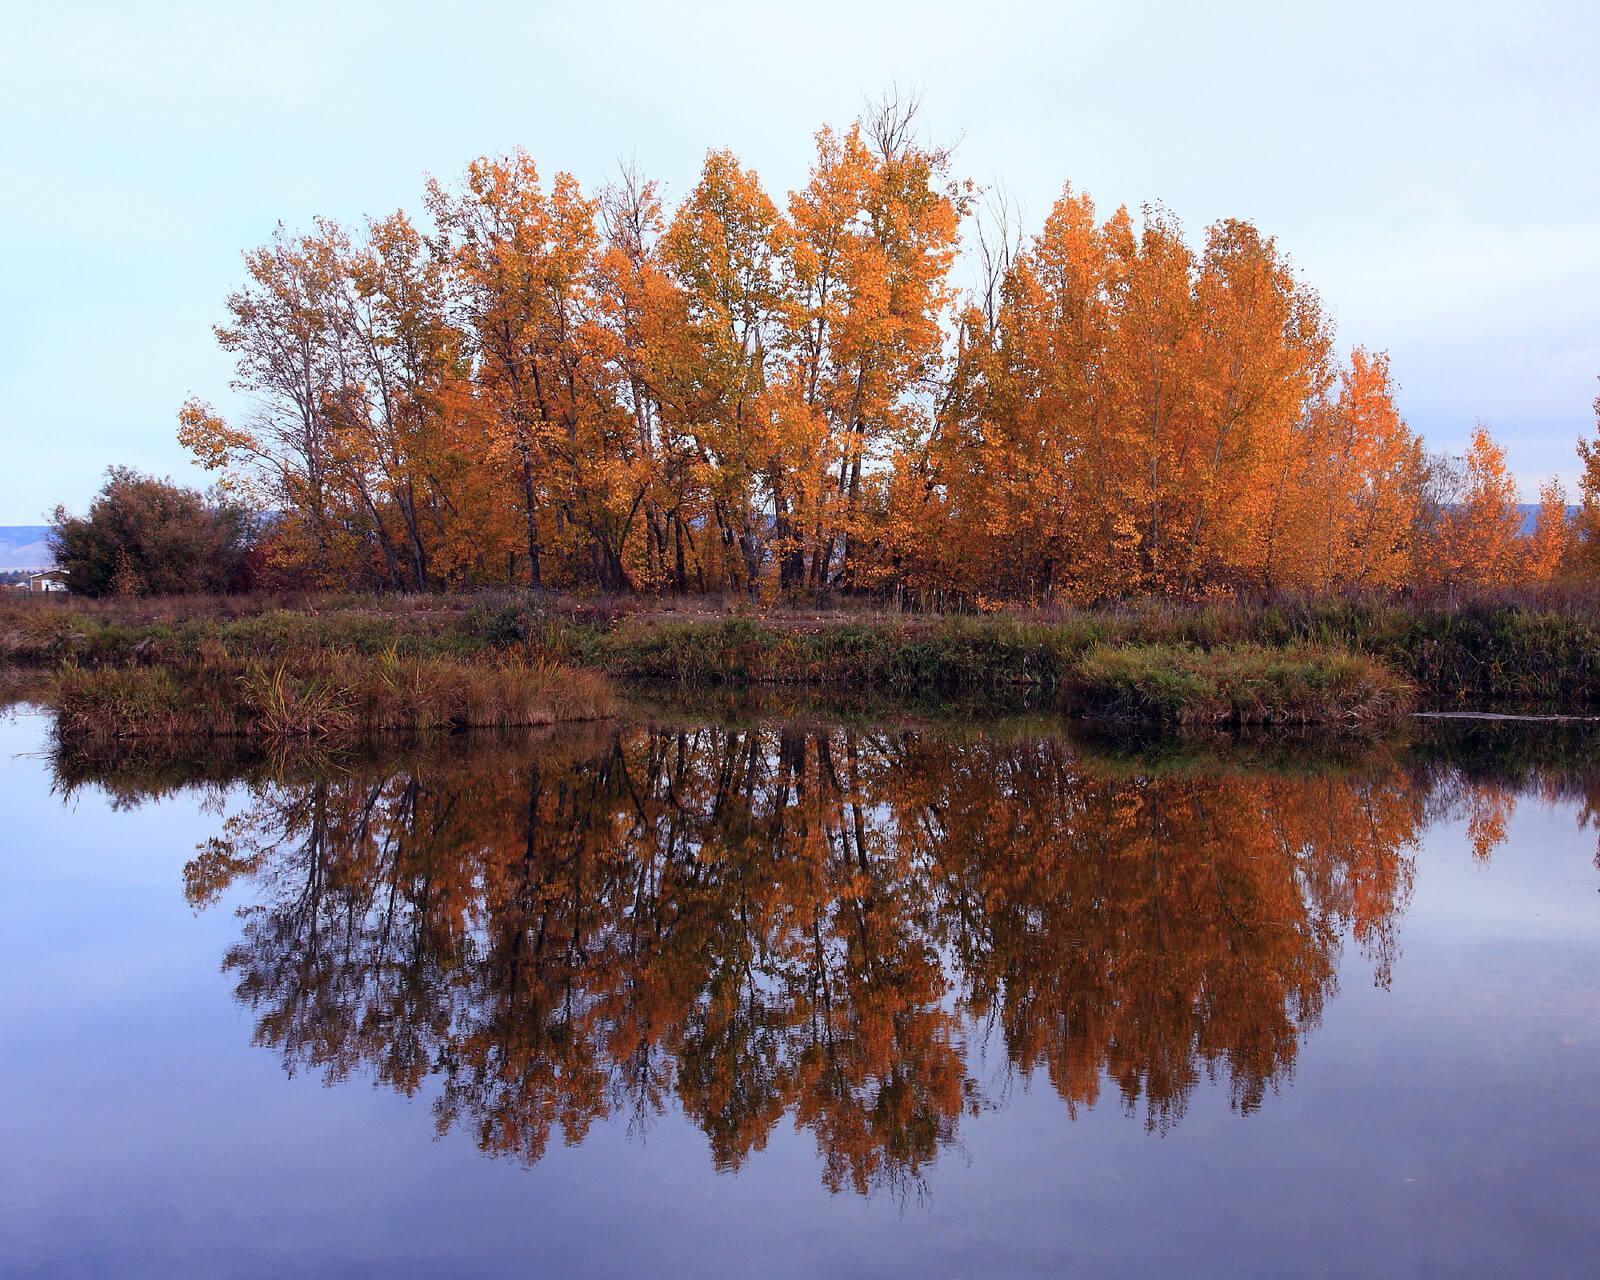 Woodhouse Ponds, Ellensburg in autumn - Photo by Jl Cummins